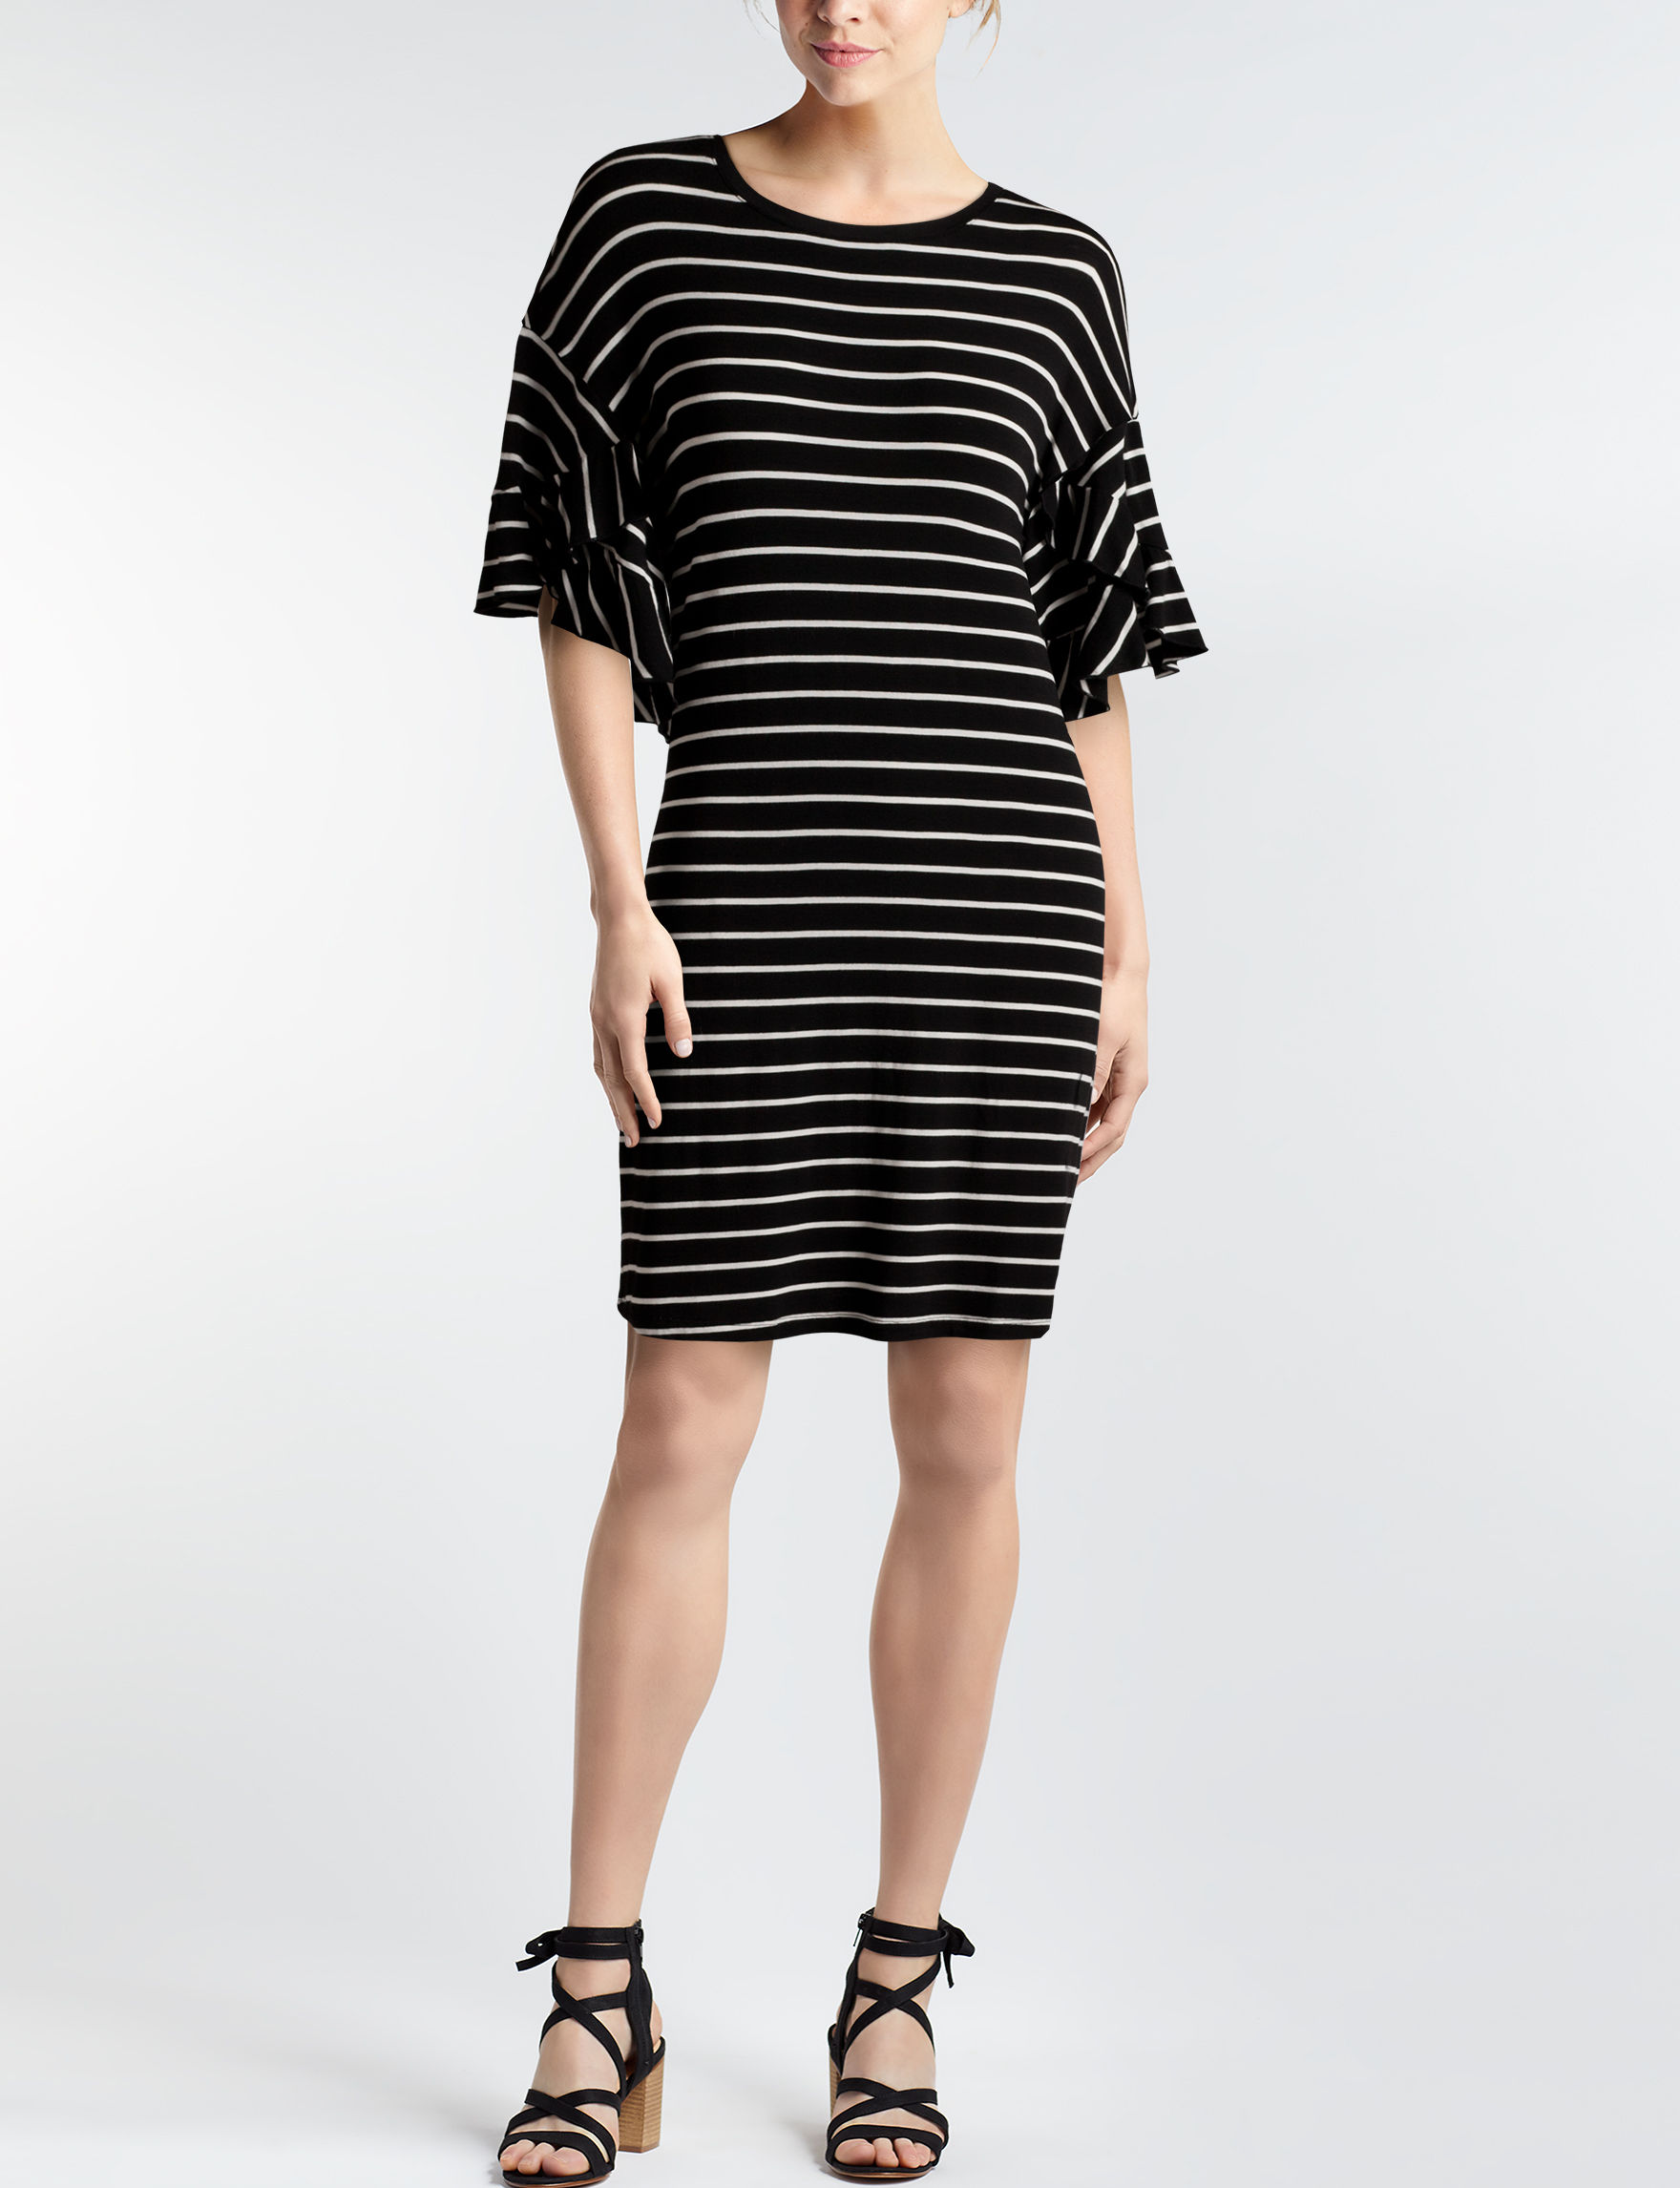 Signature Studio Black / White Everyday & Casual Shift Dresses